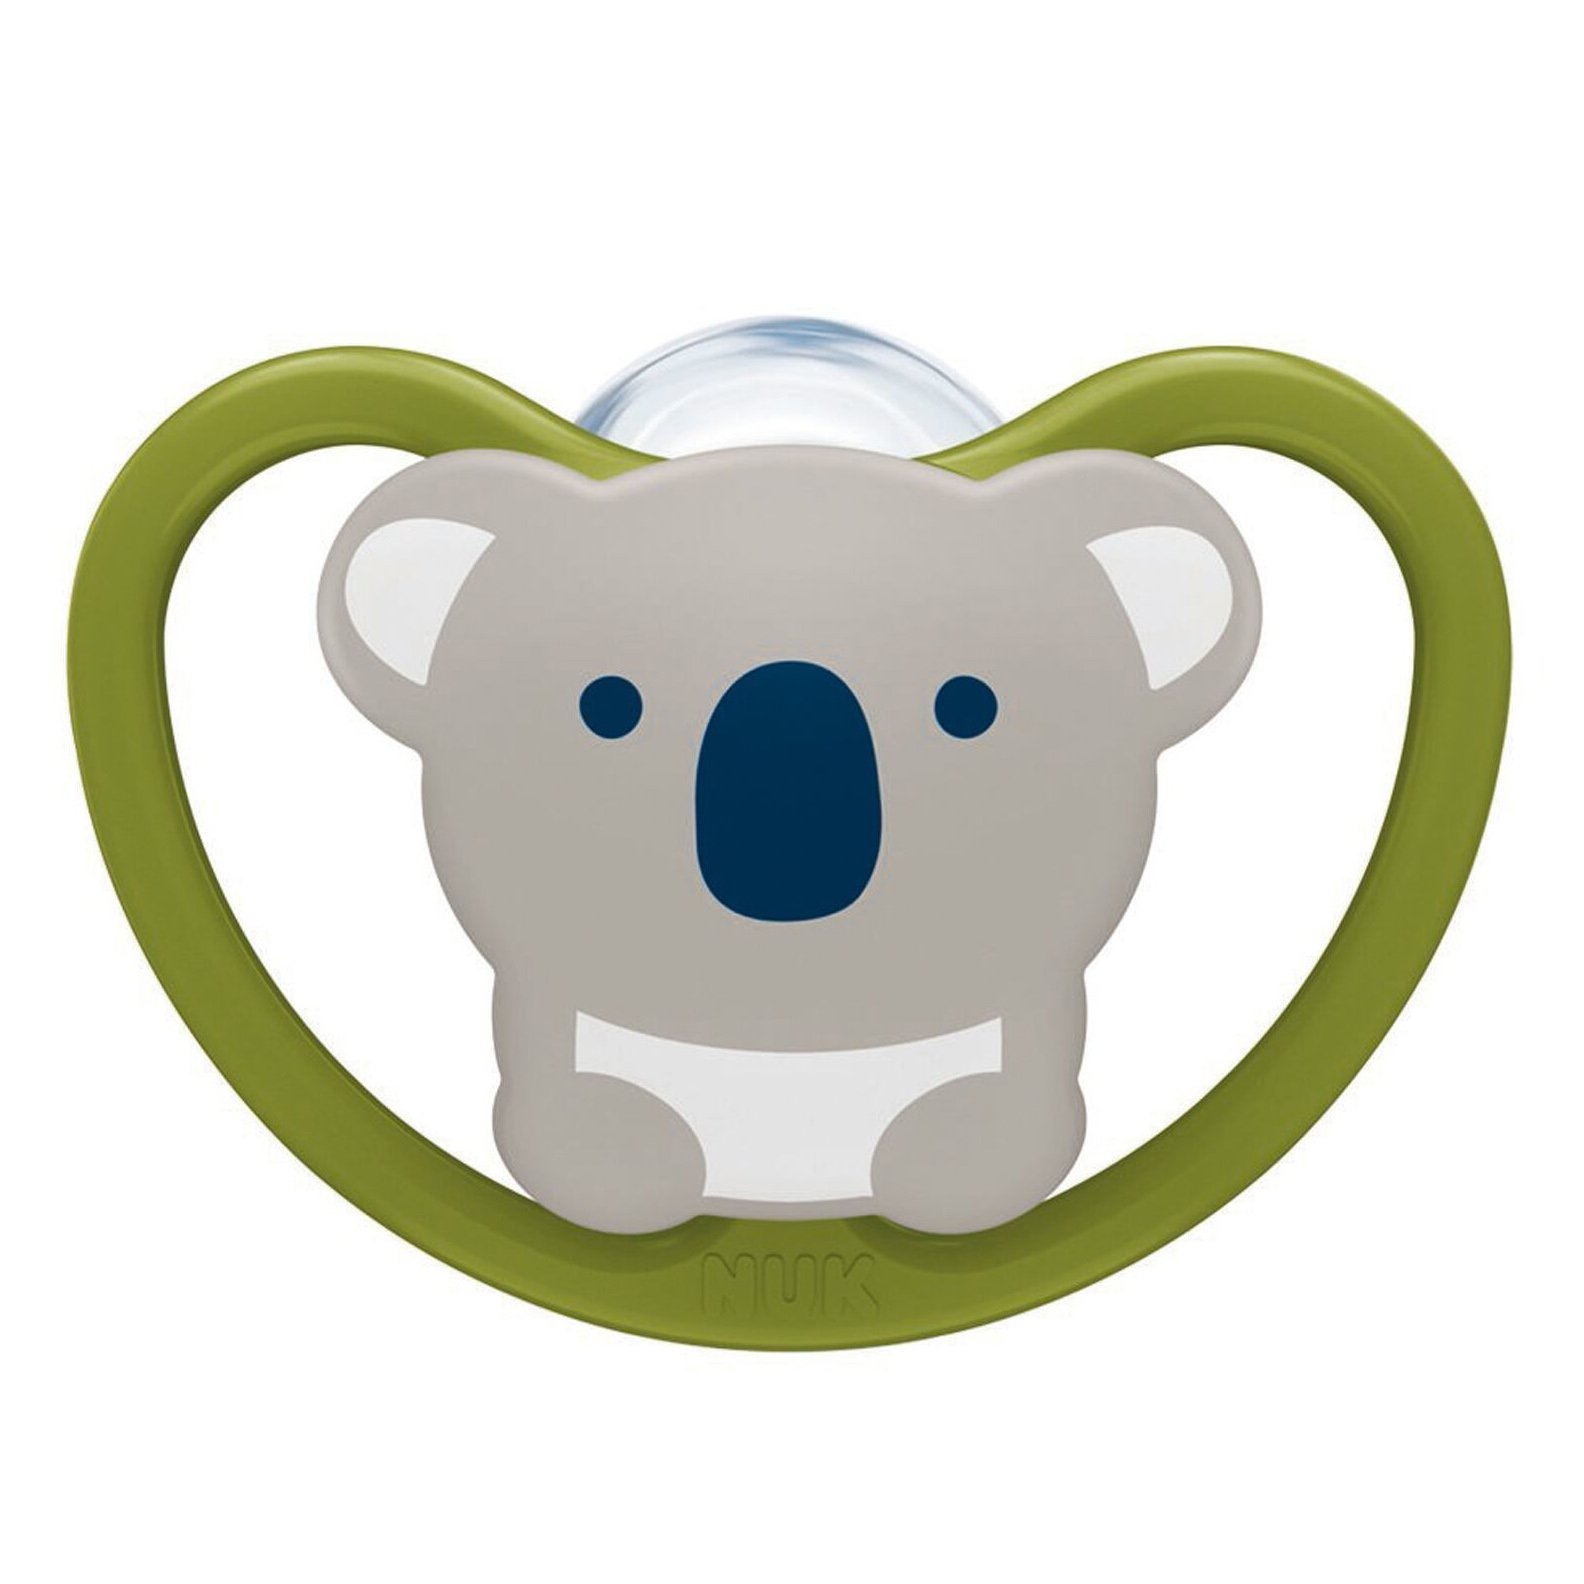 Nuk Space Πιπίλα Σιλικόνης με Πρωτοποριακό Σχεδιασμό που Επιτρέπει στην Ευαίσθητη Βρεφική Επιδερμίδα να Αναπνέει 1 Τεμάχιο – 0-6 Μηνών Πράσινη